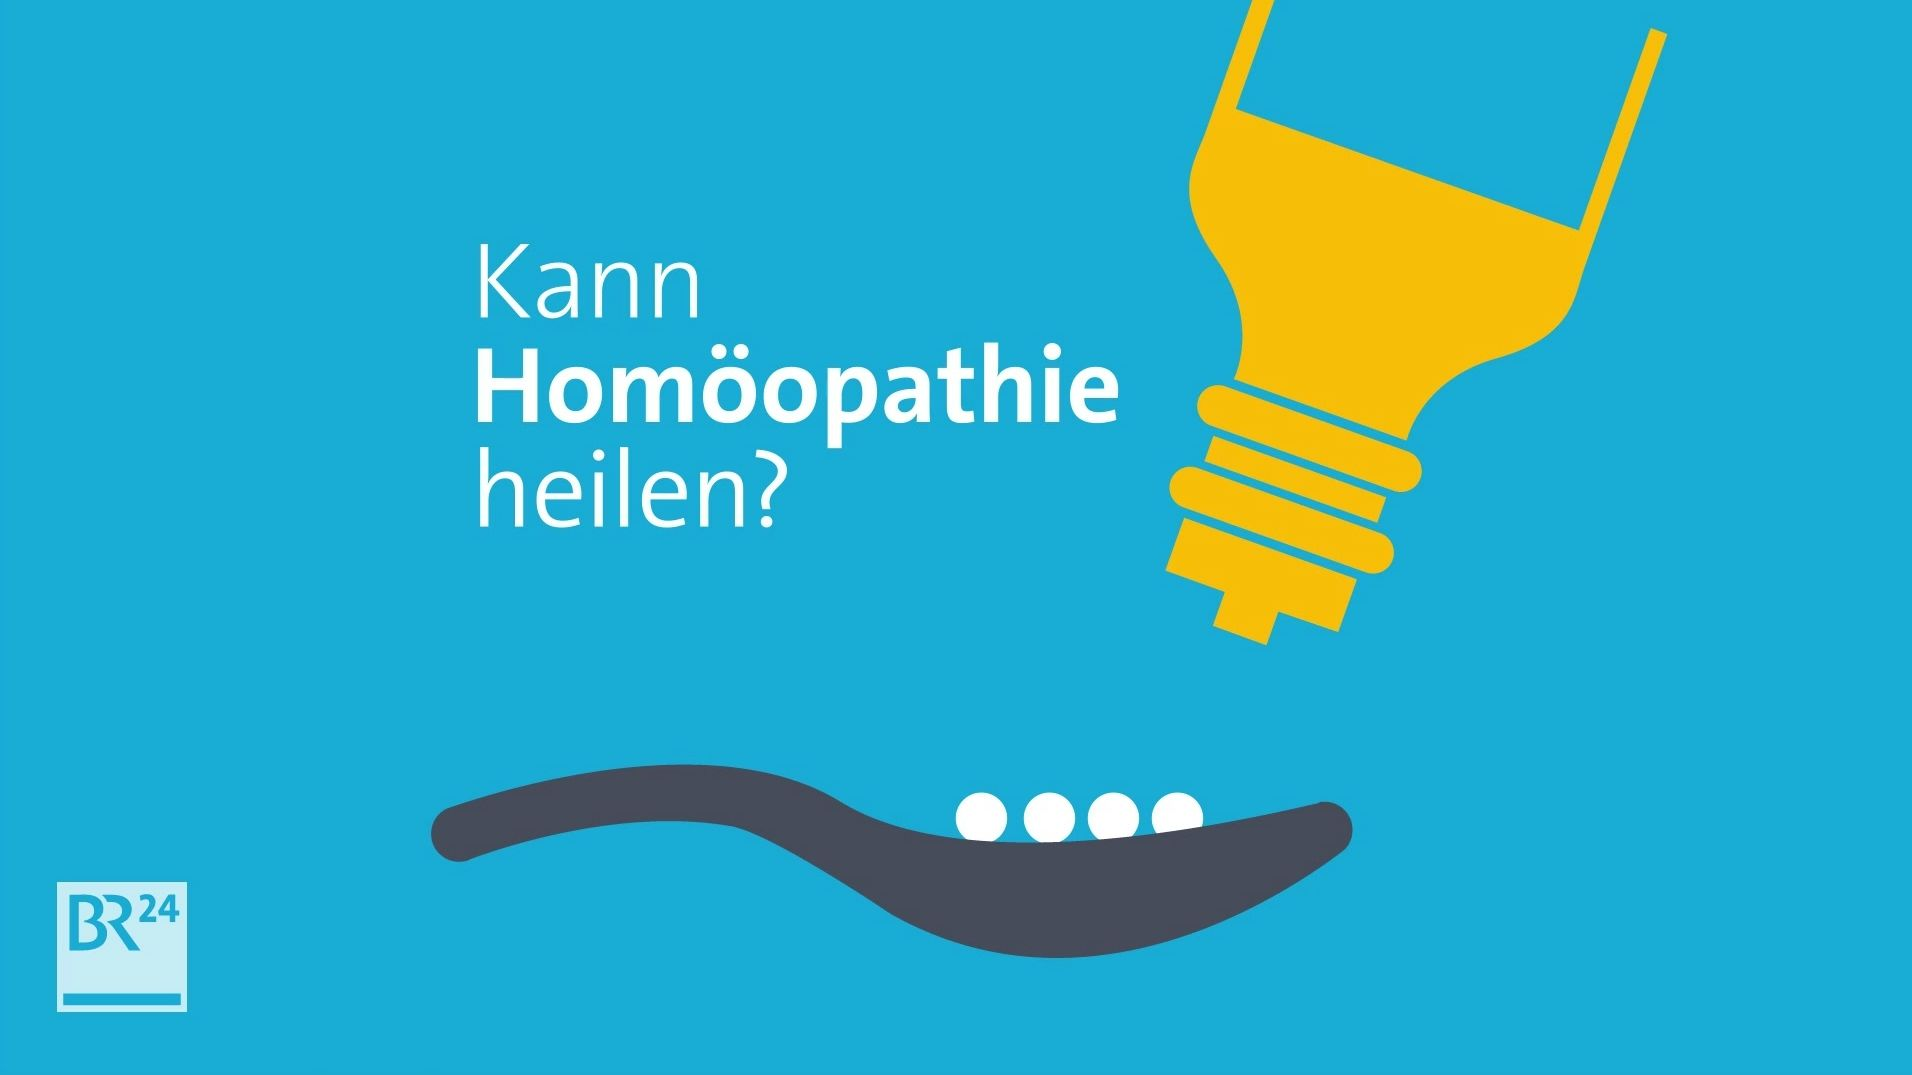 #fragBR24💡 Kann Homöopathie heilen?